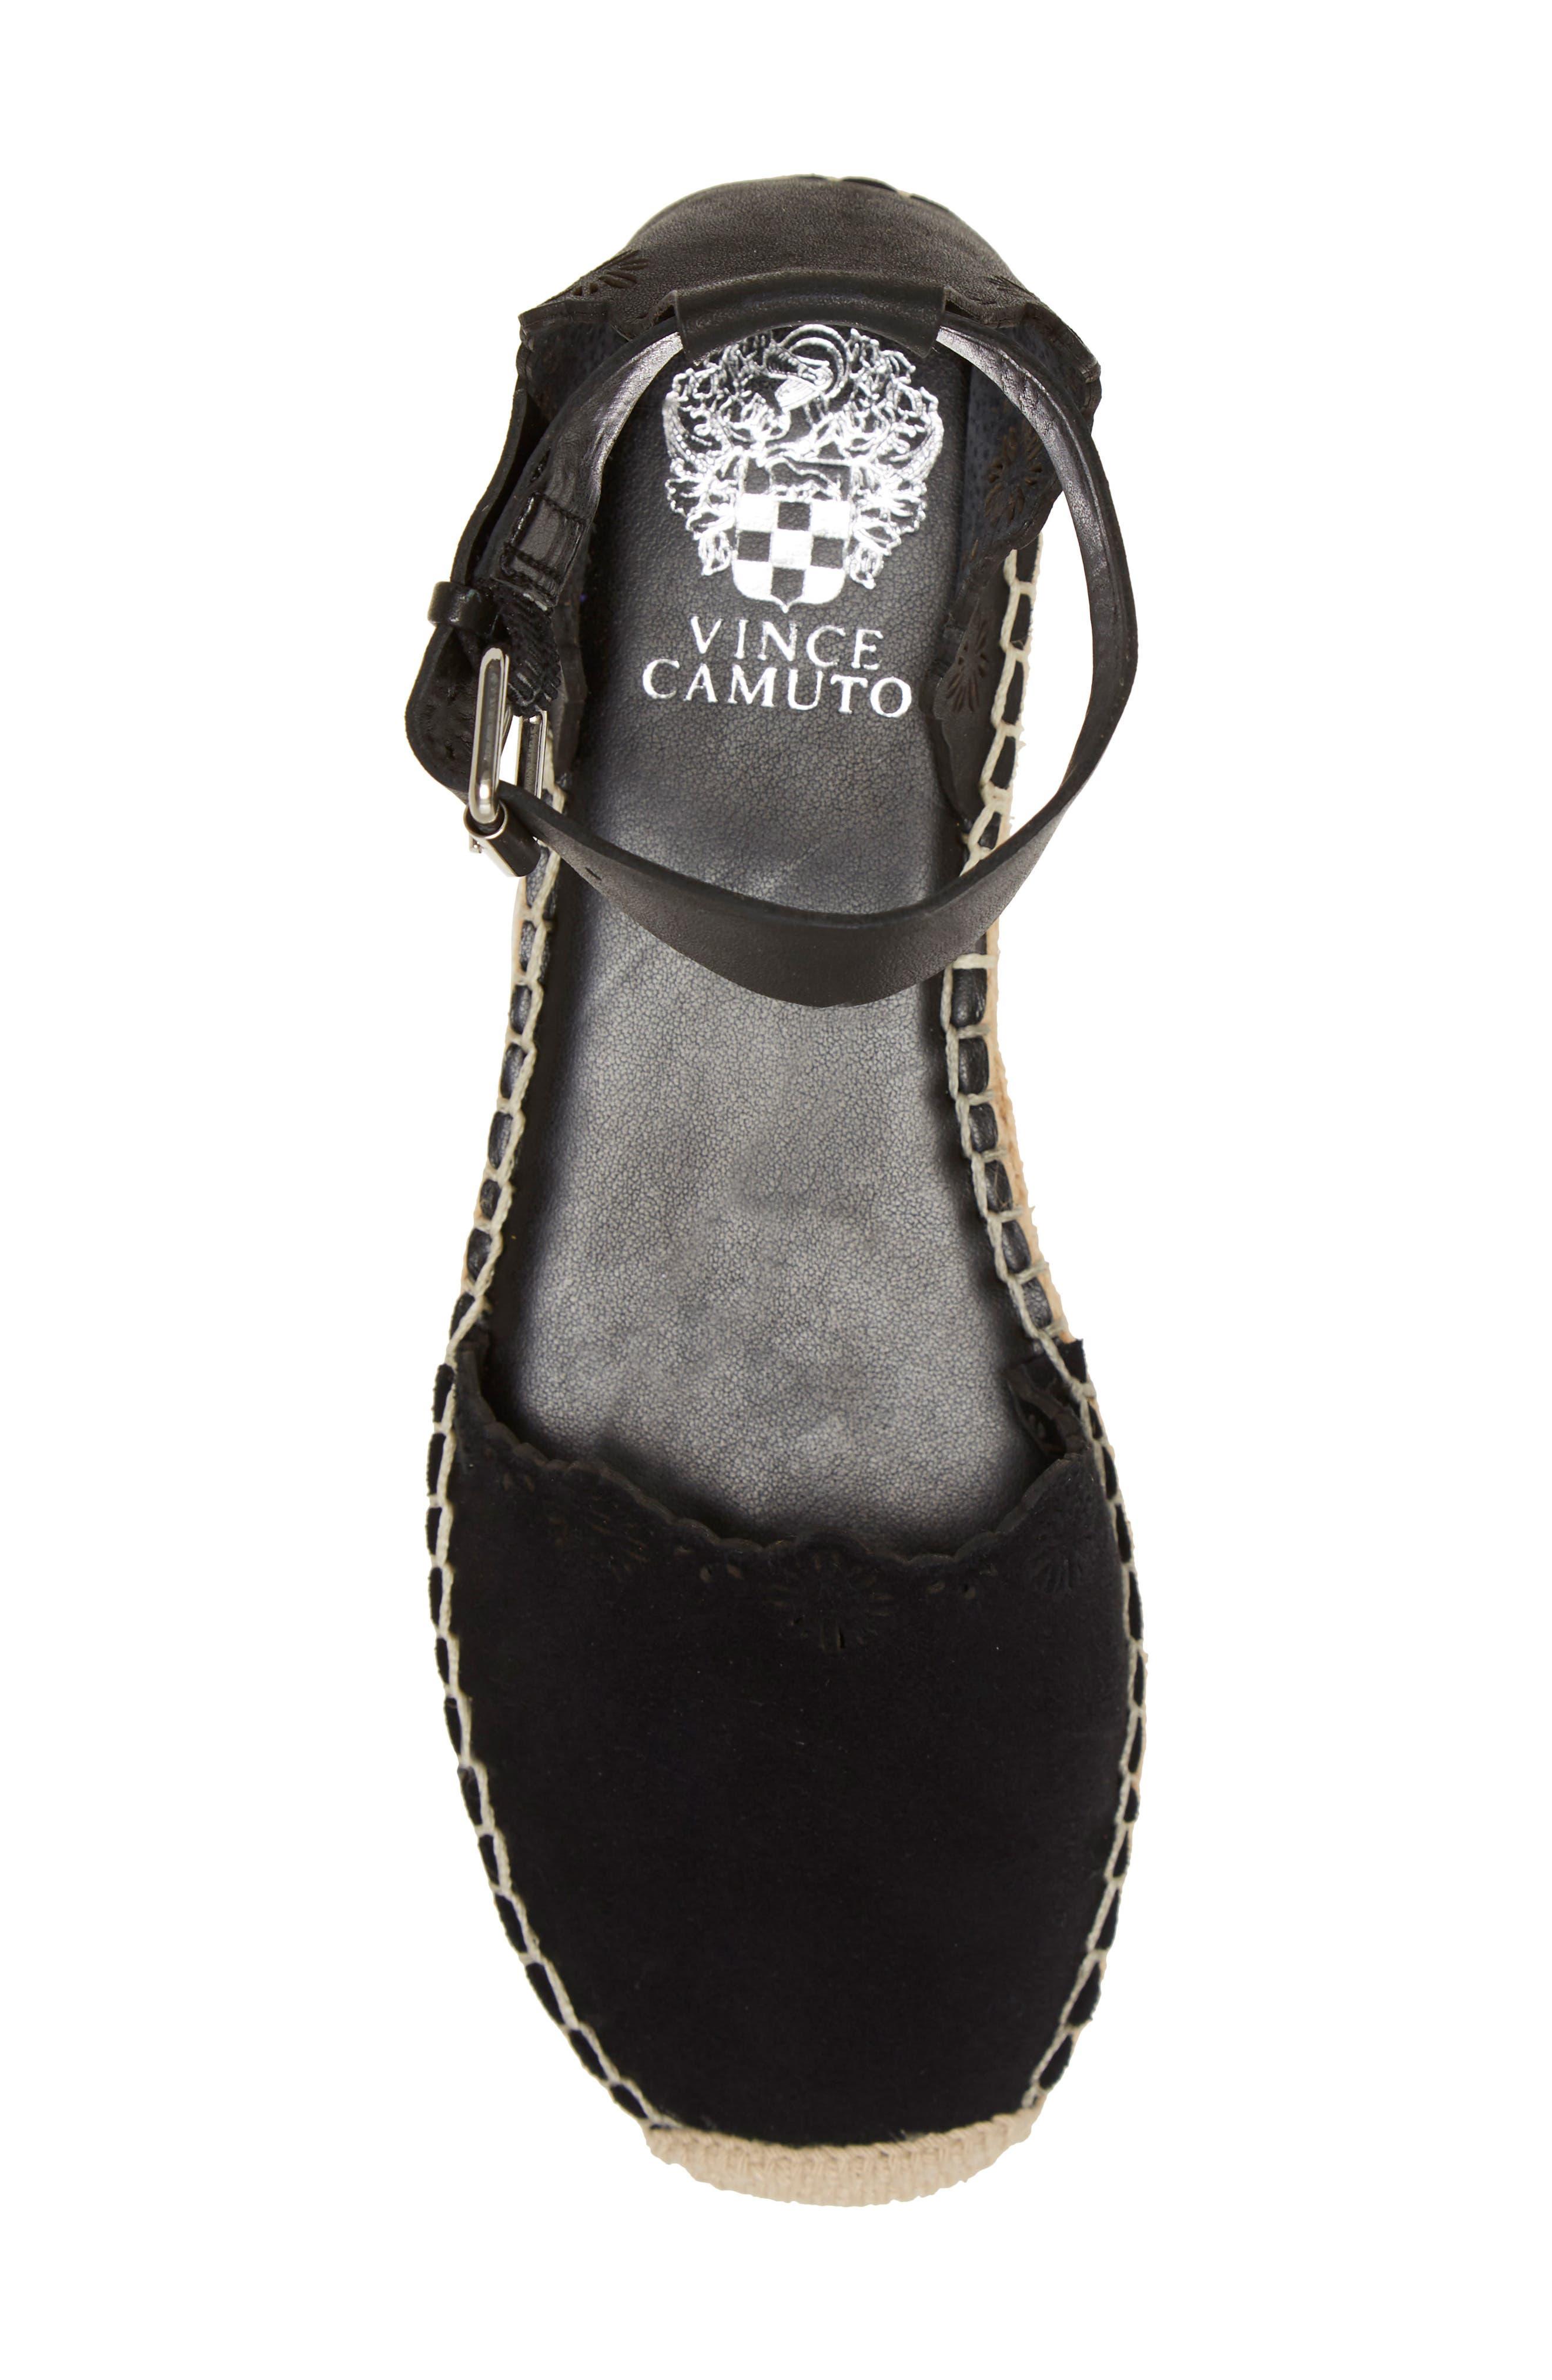 VINCE CAMUTO,                             Breshan Ankle Strap Espadrille Wedge,                             Alternate thumbnail 5, color,                             BLACK SUEDE